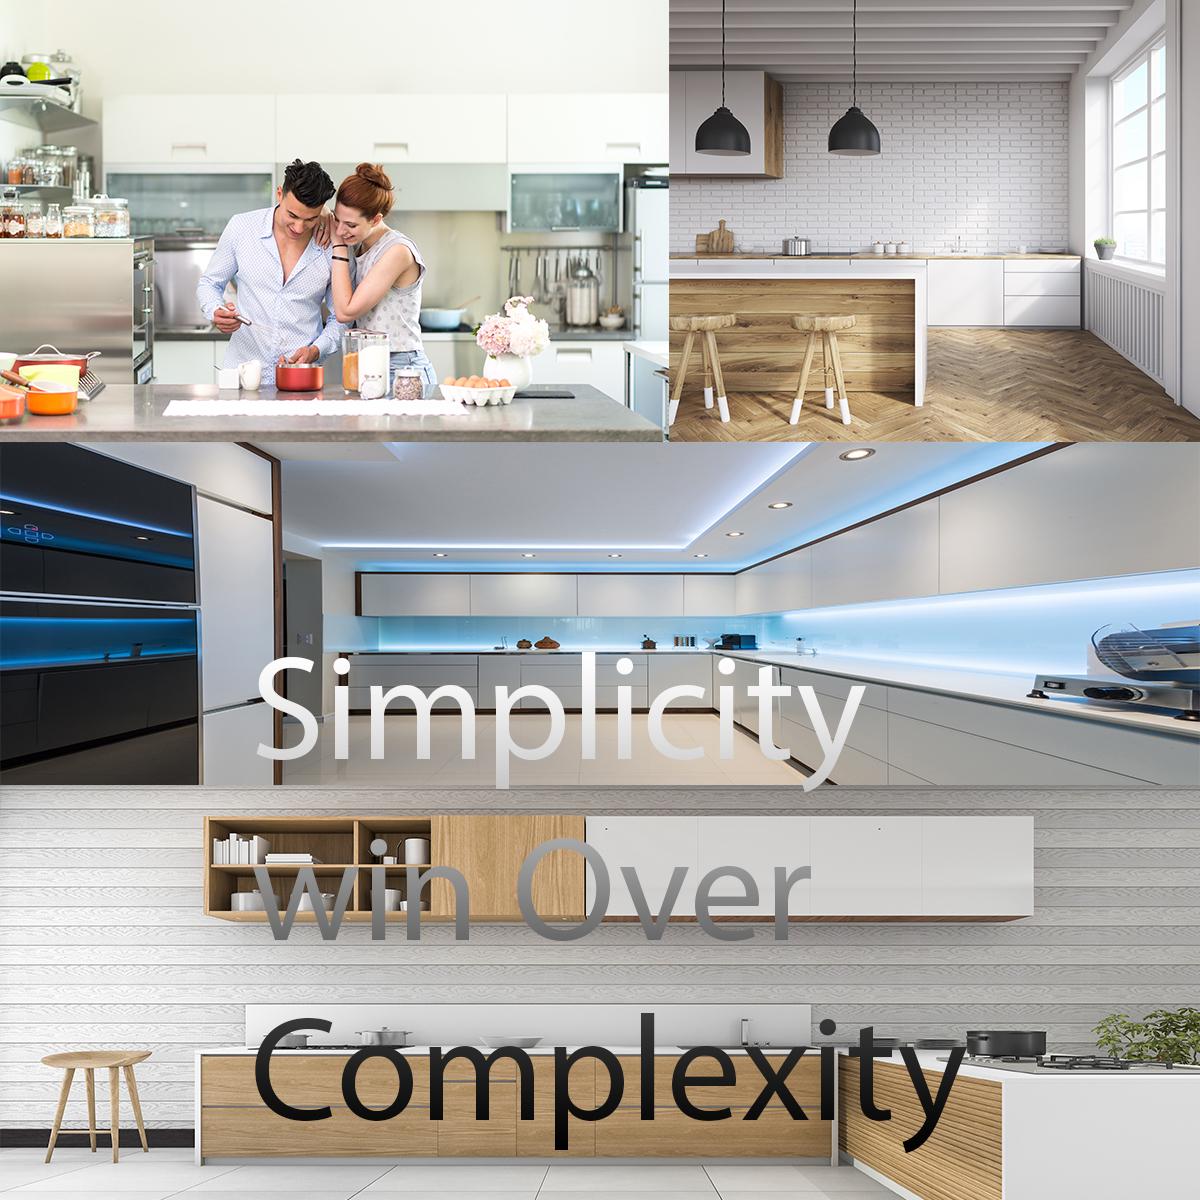 https://wudbell.com/wp-content/uploads/2020/03/New-shape-kitchen-1-1.jpg